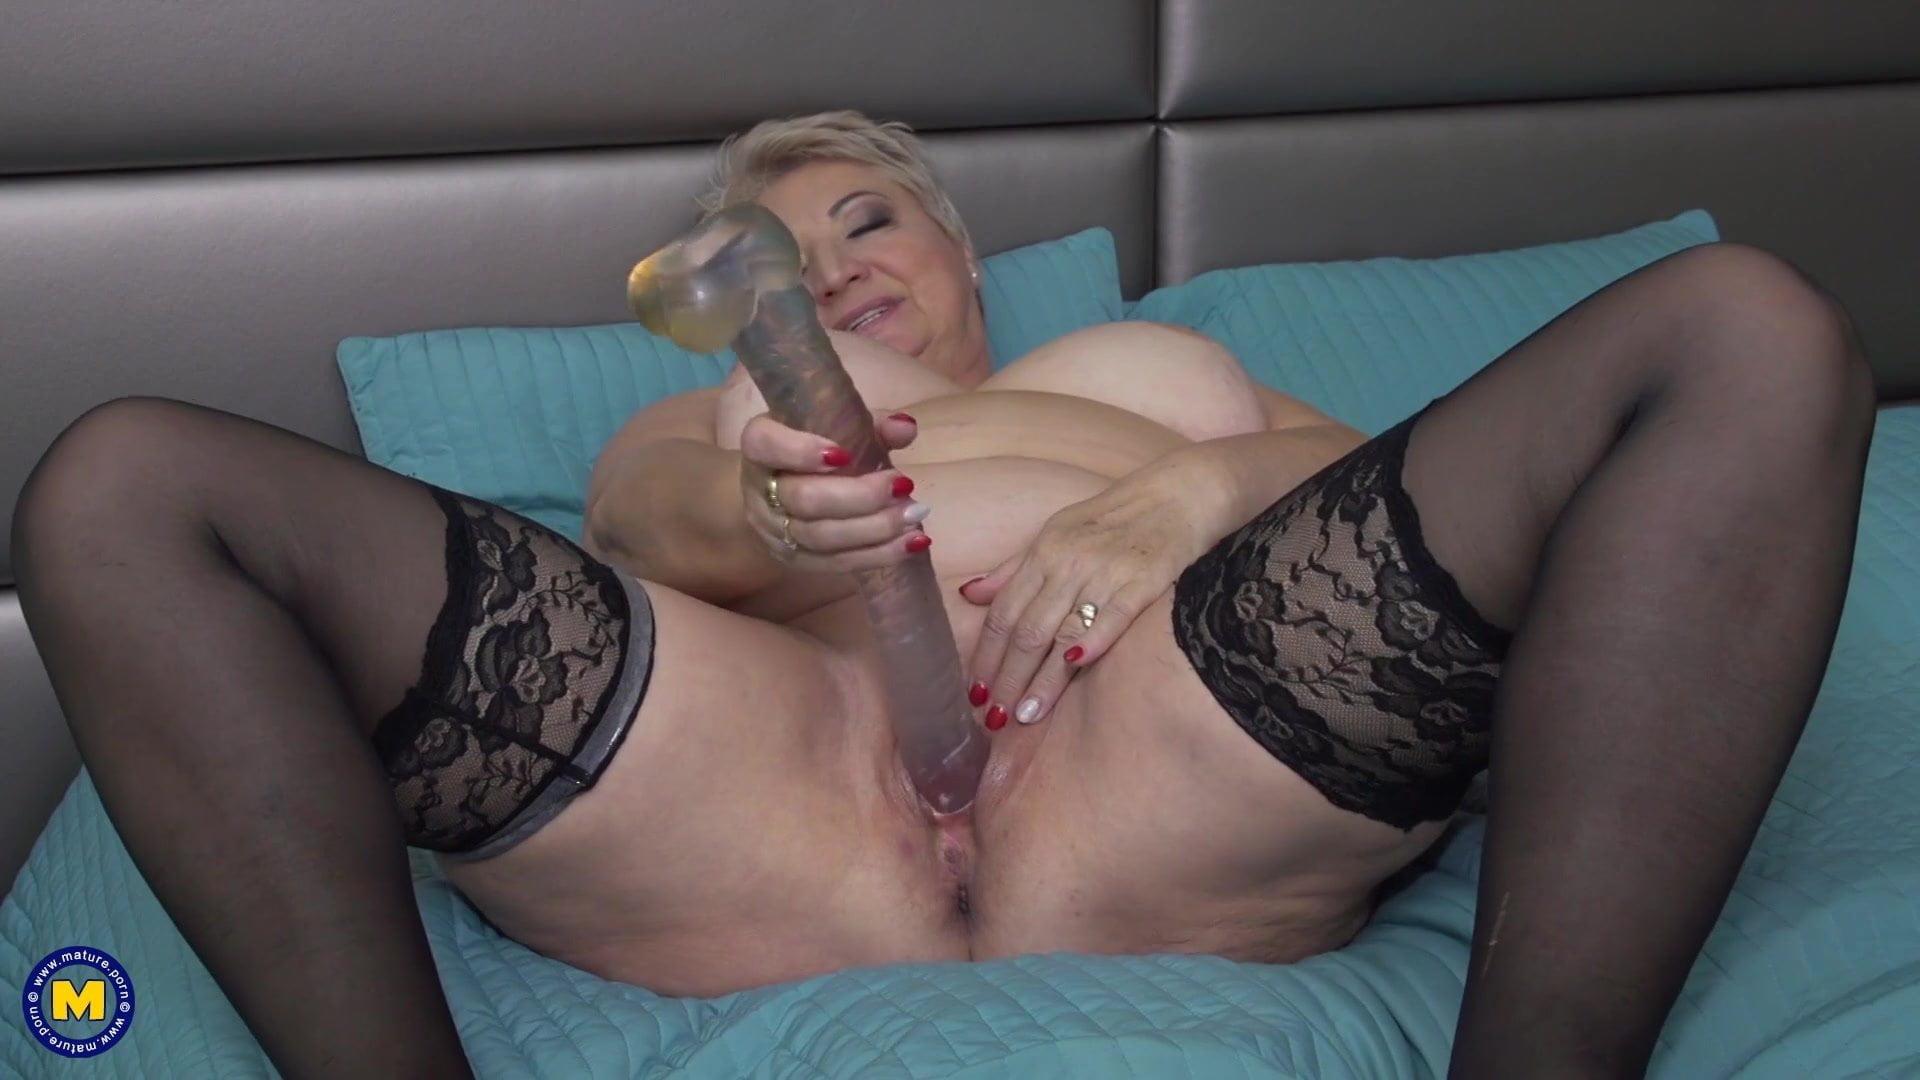 Grandma's first dildo